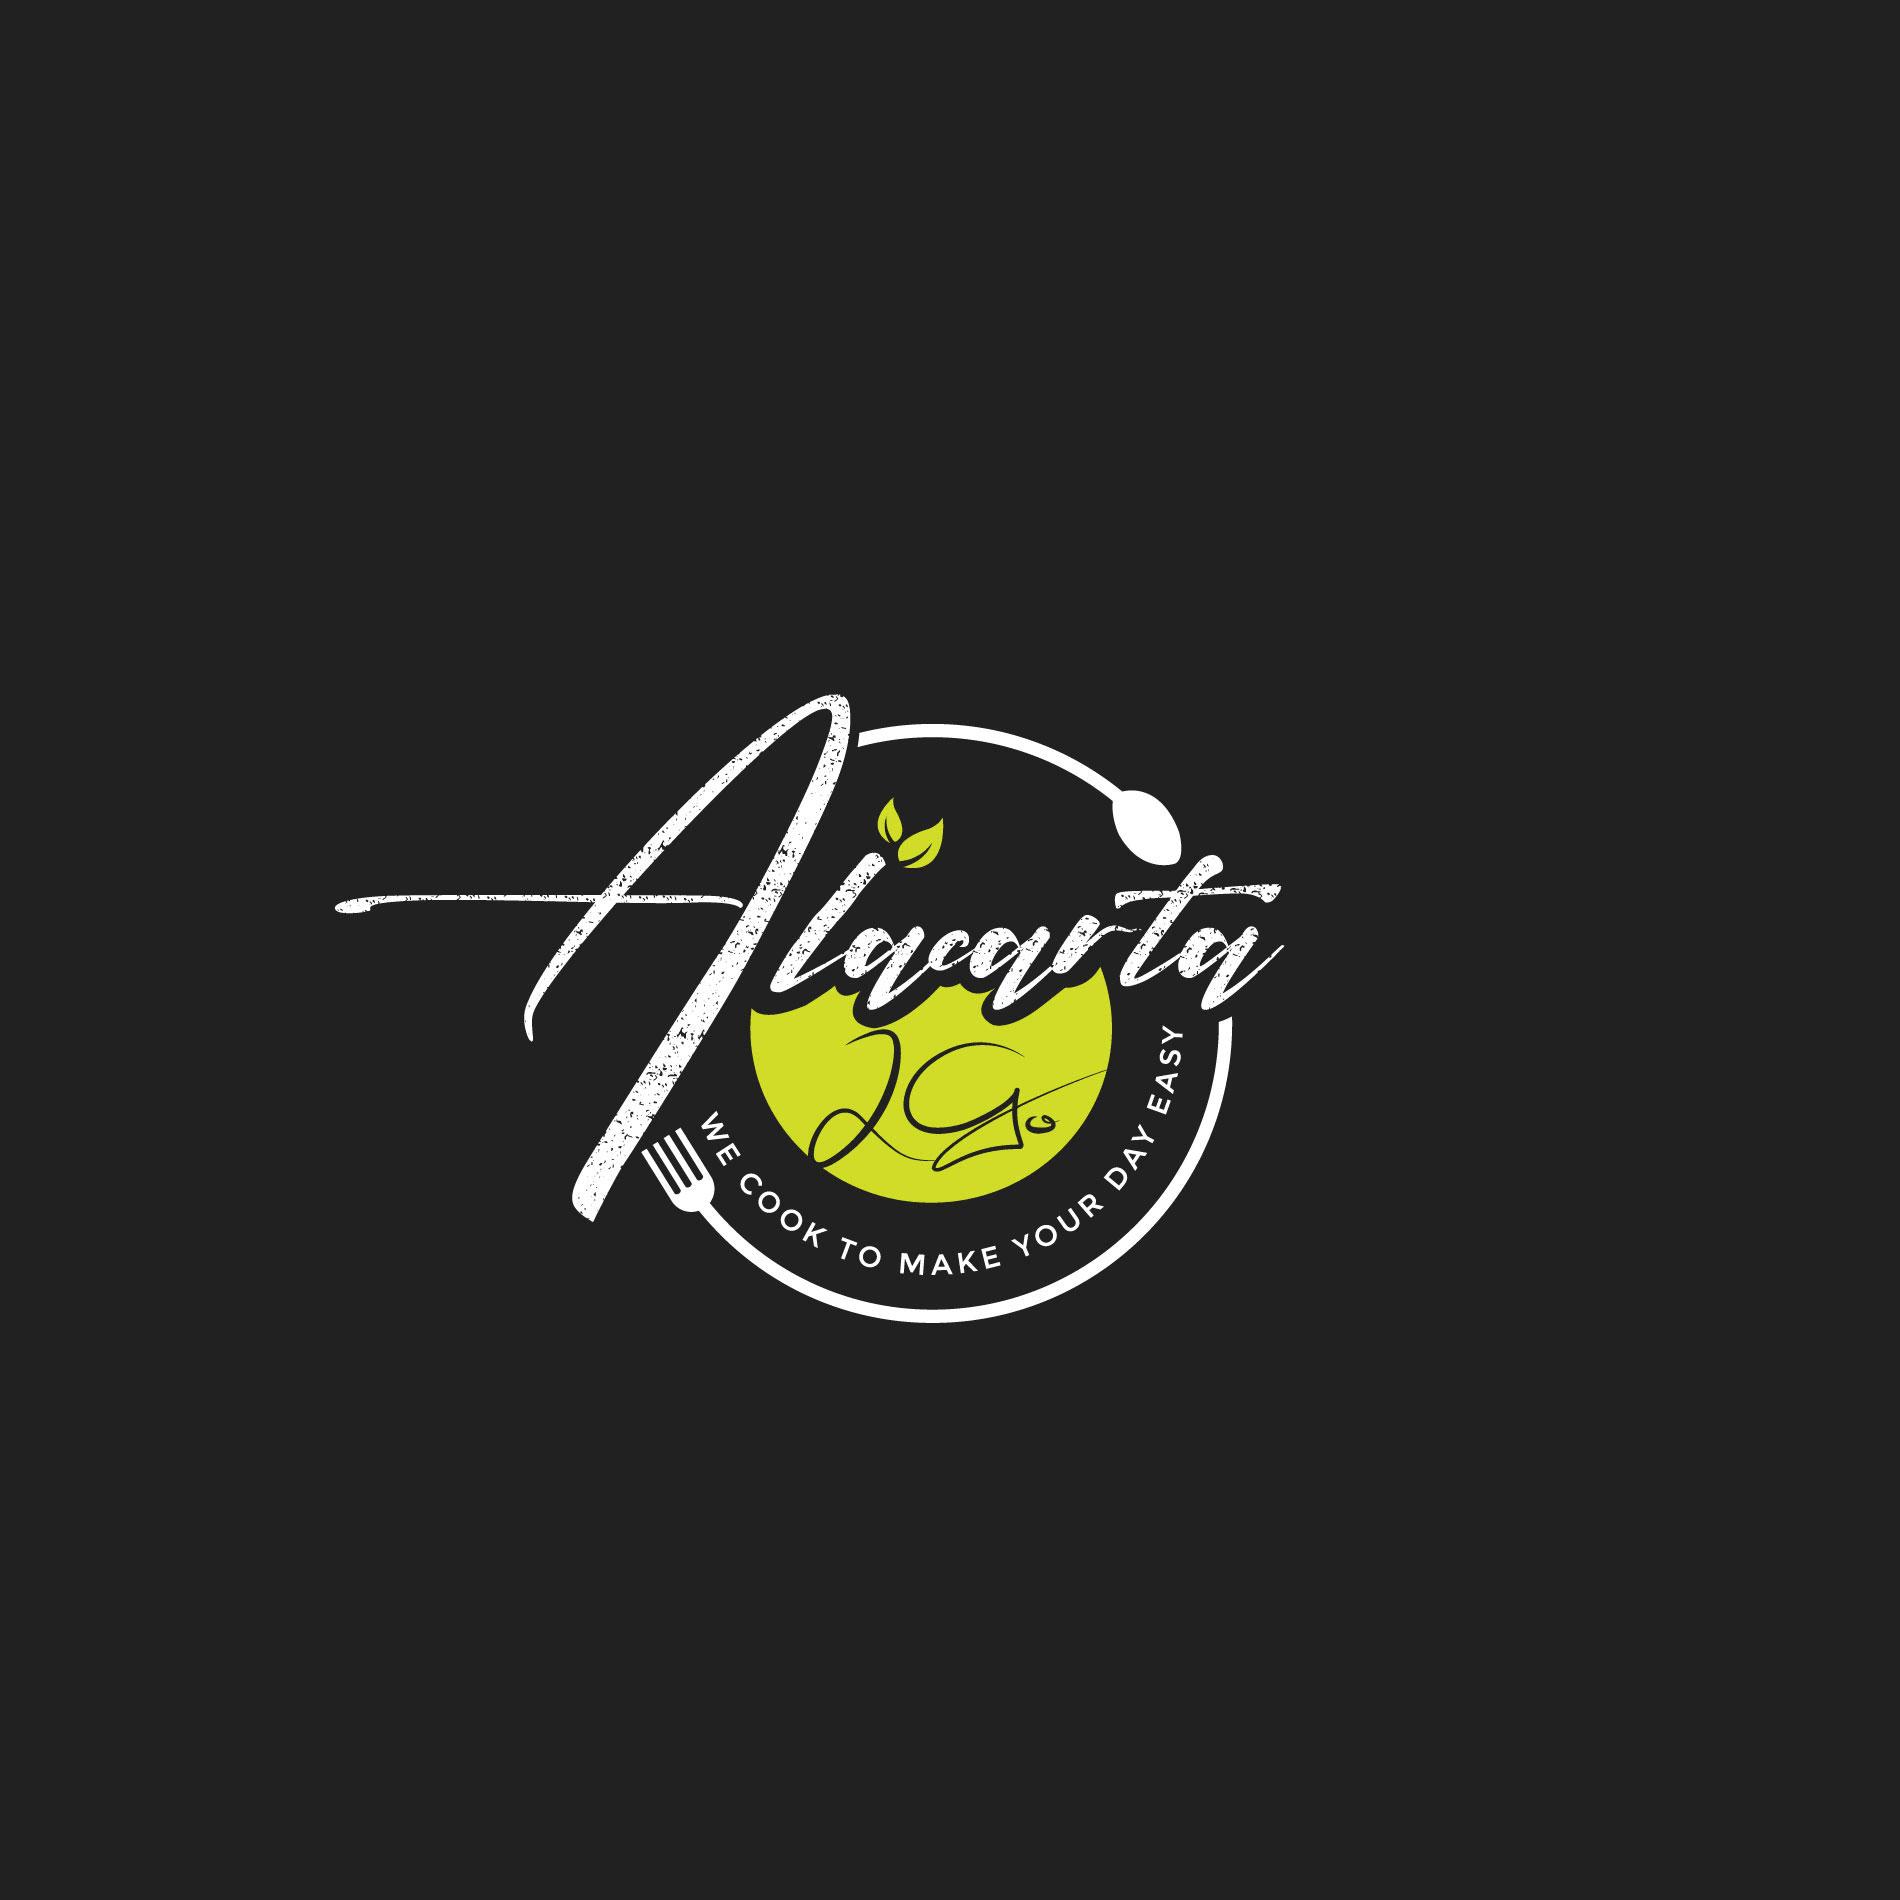 I will make restaurant logo, food, cafe,  coffee shop design